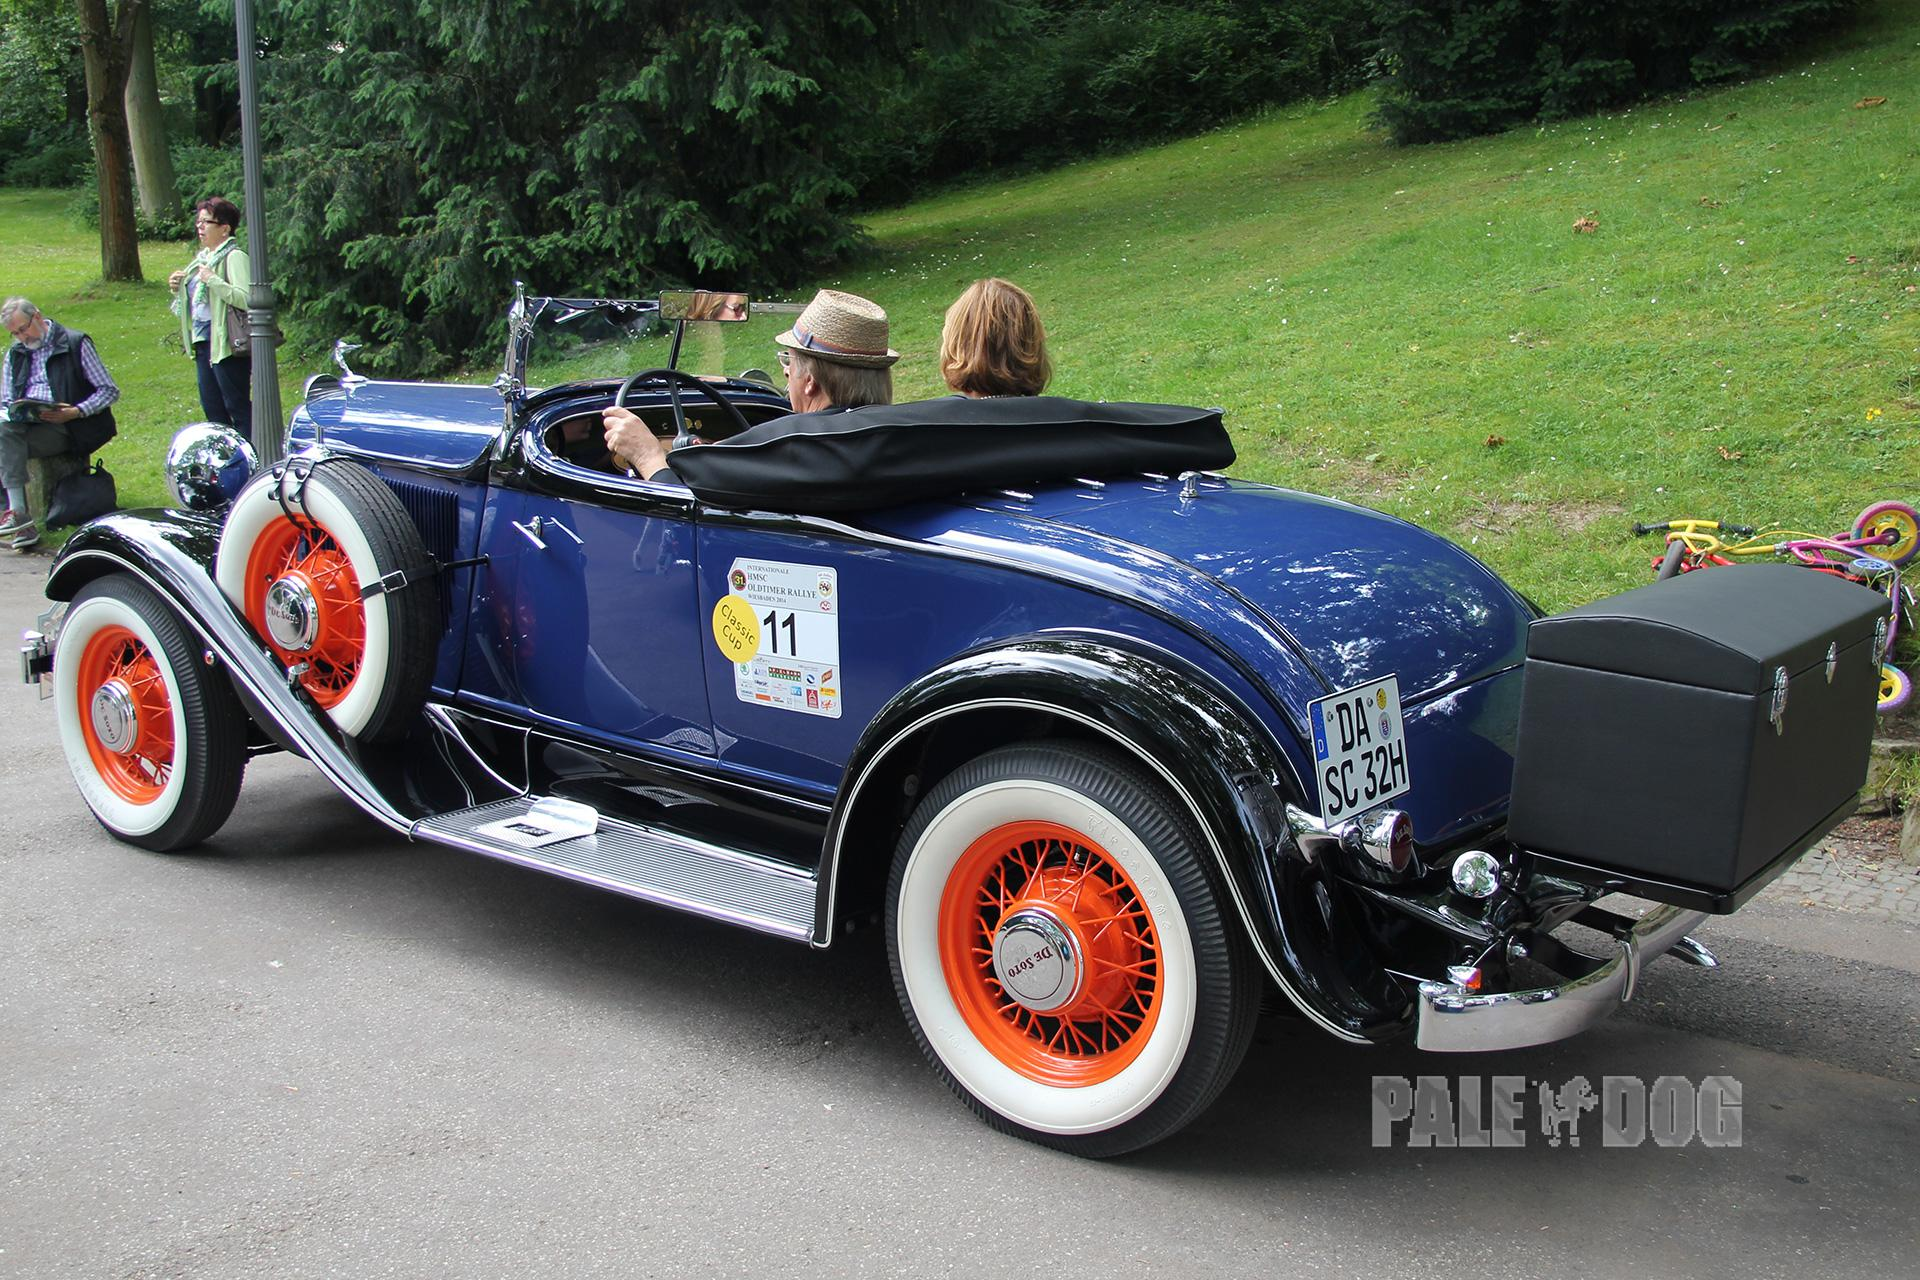 1932 Desoto Standard 6 Sc Roadster Rear View Post Vintage Paledog Photo Collection